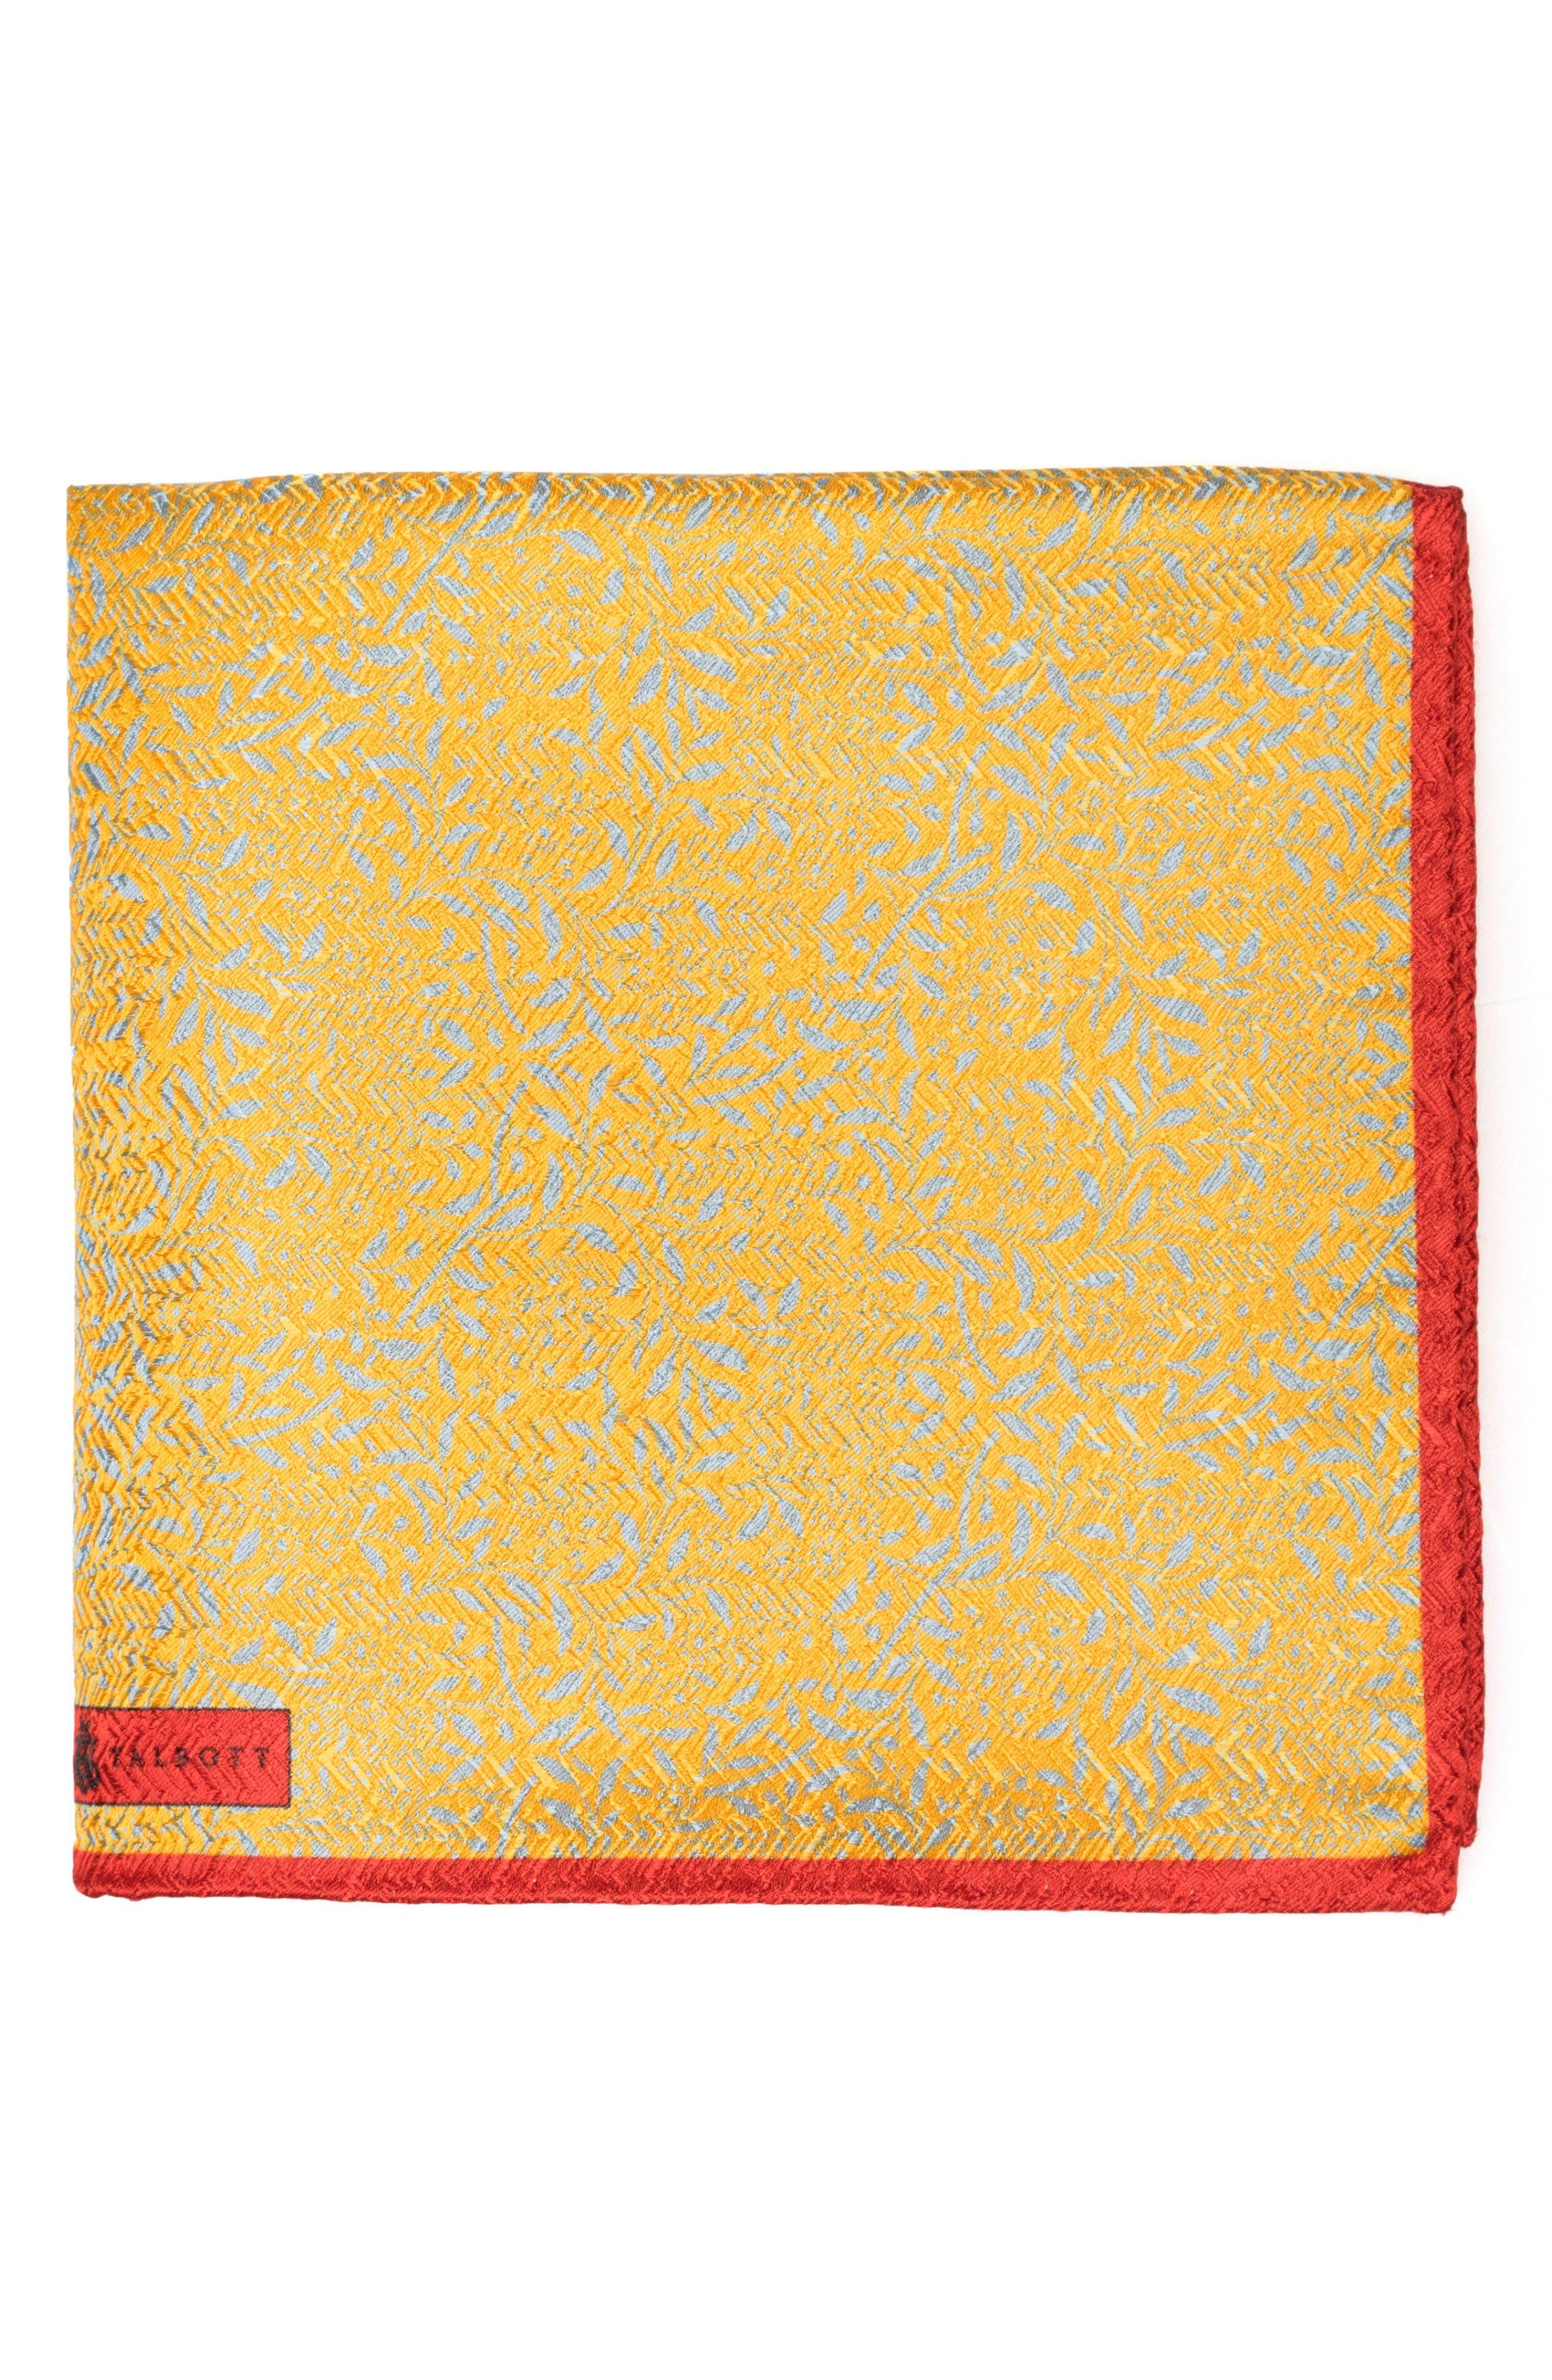 Main Image - Robert Talbott Floral Silk Pocket Square